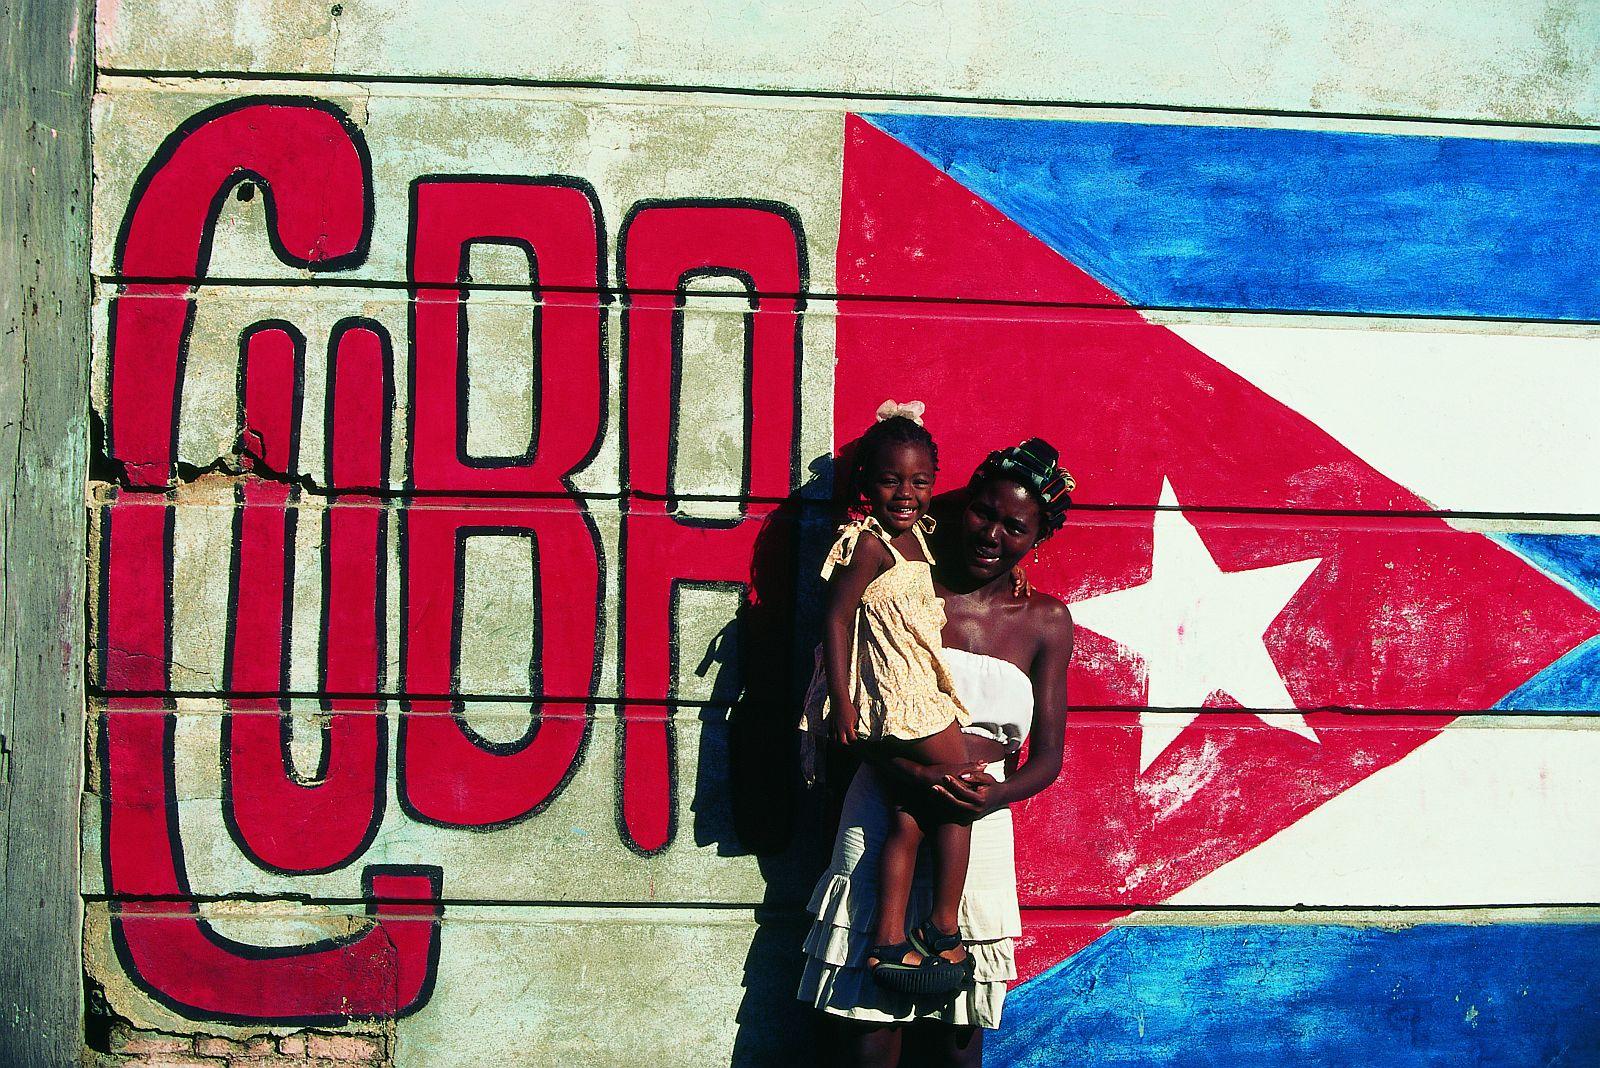 Peru Bolivya Panama Küba Meksika Galapagos Patagonya Arjantin Şili Turları 2015-2016